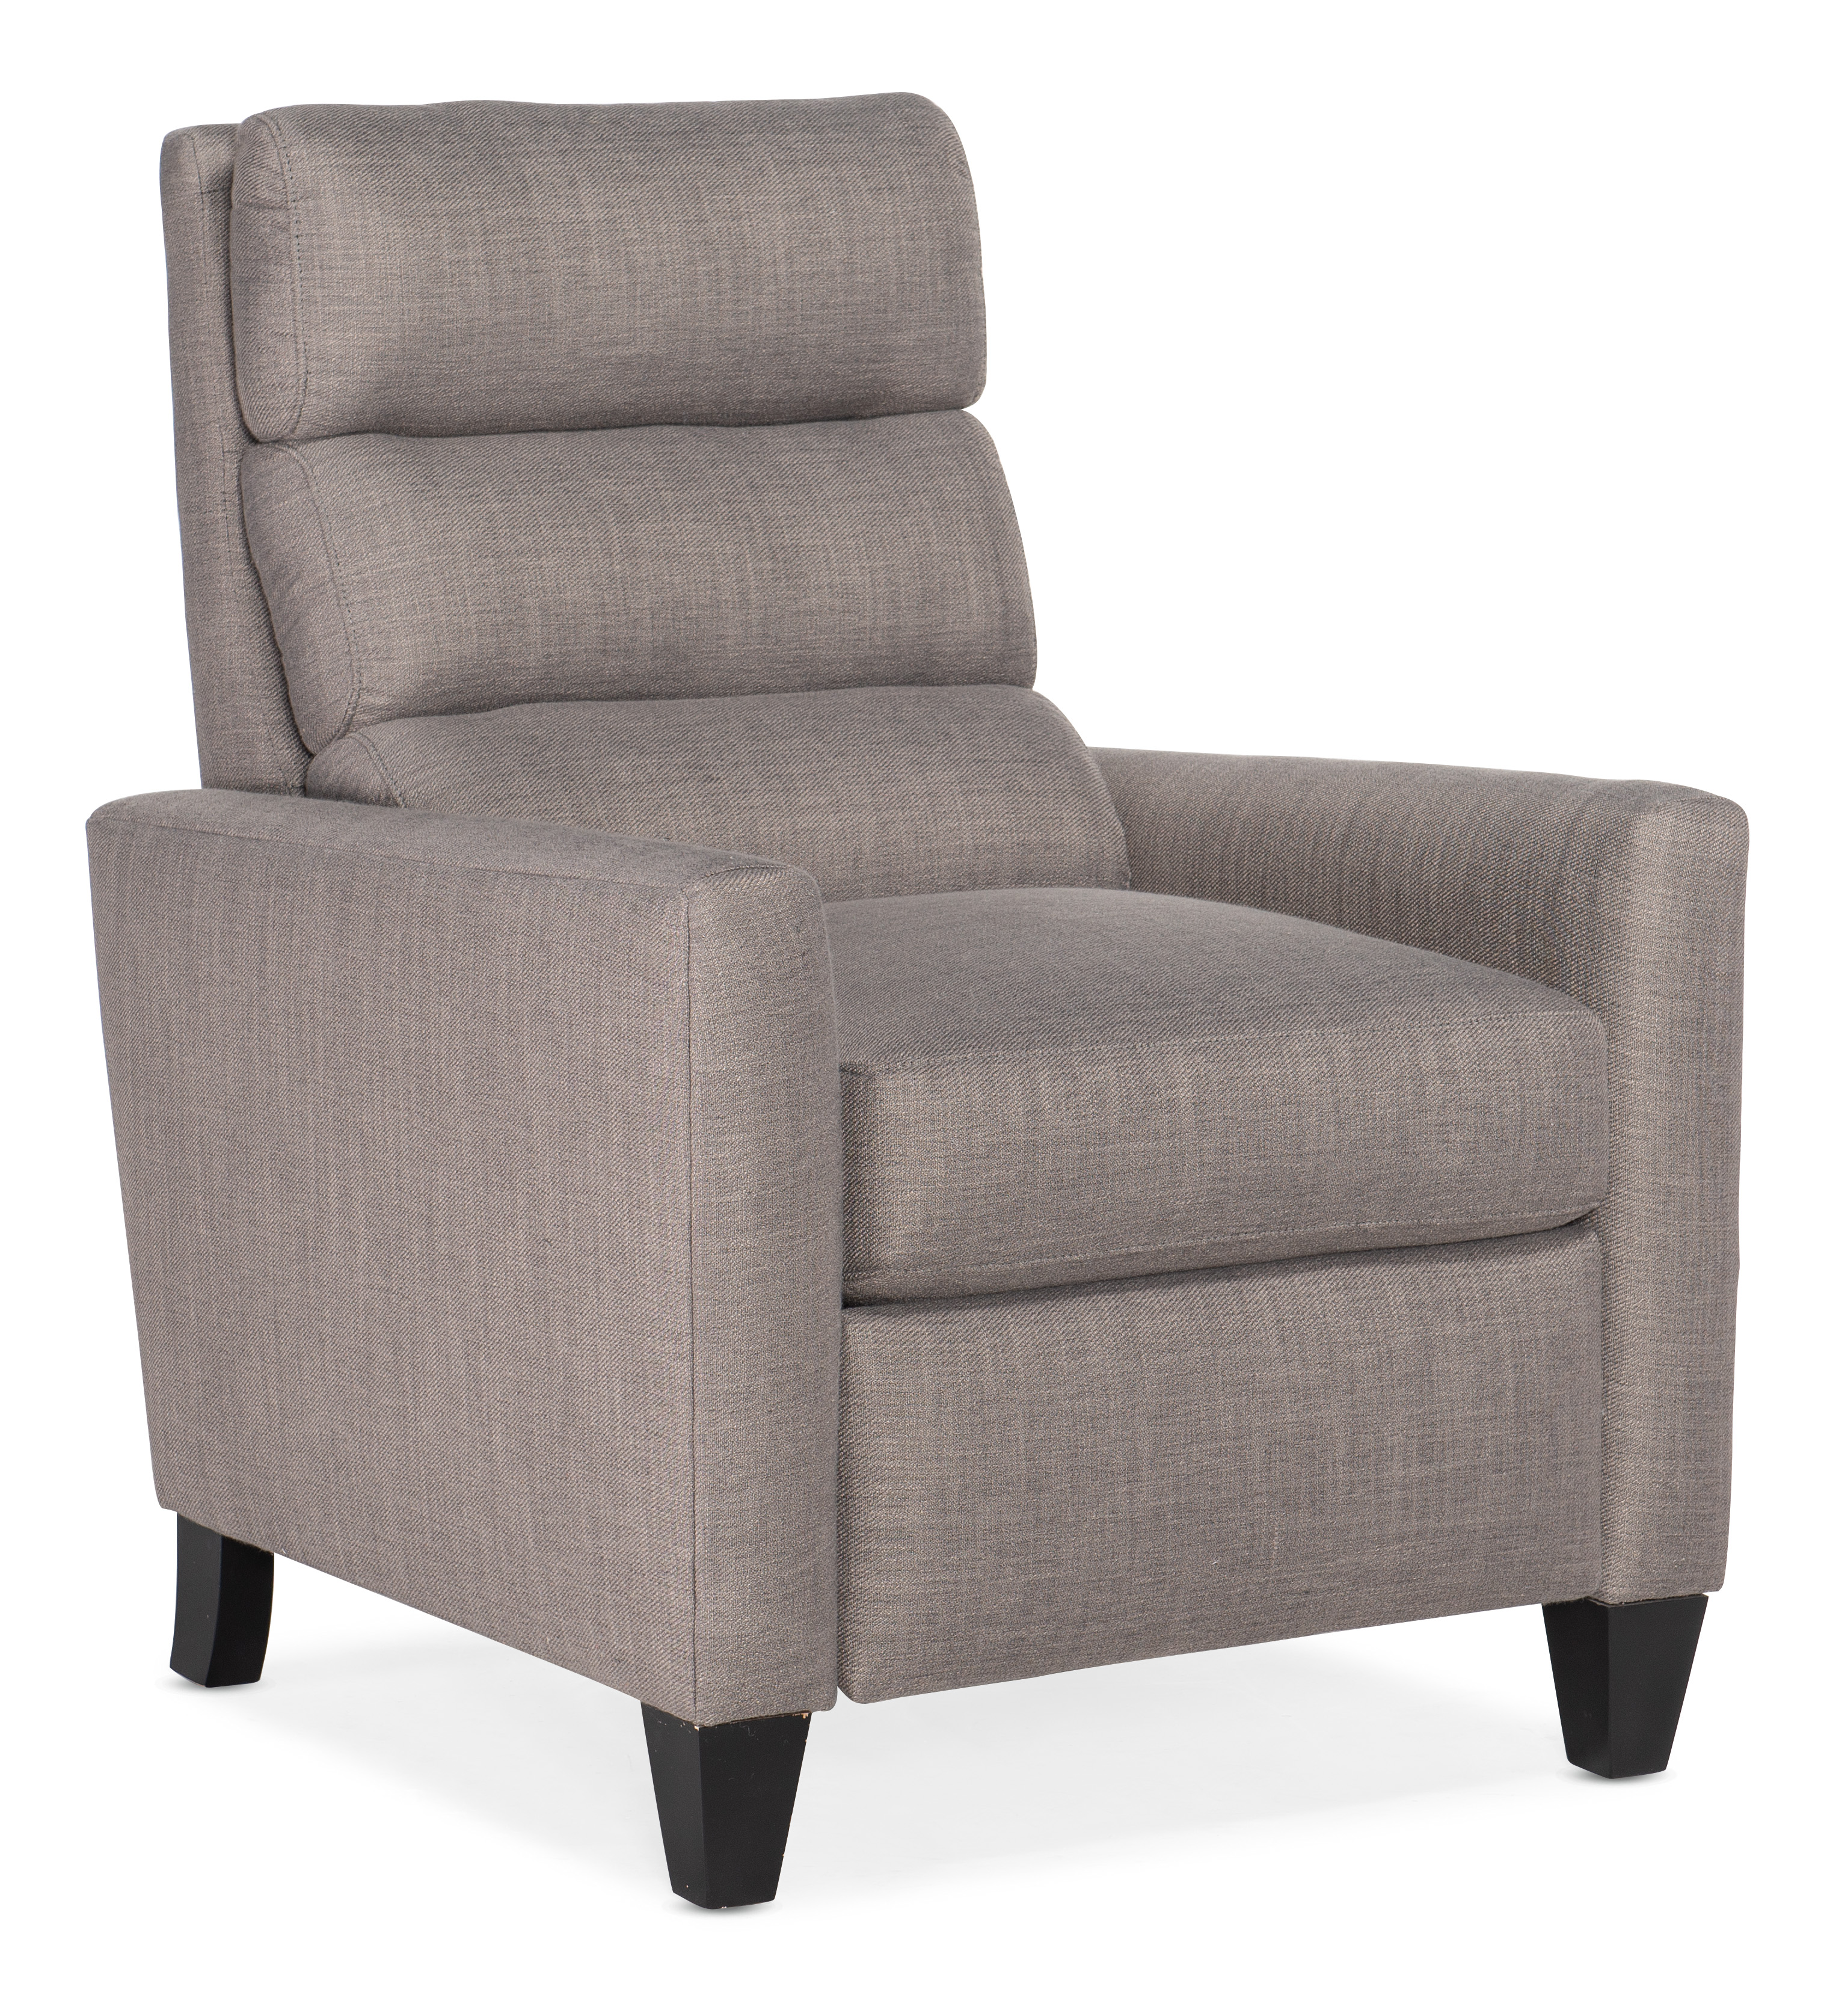 3-Way Reclining Chair